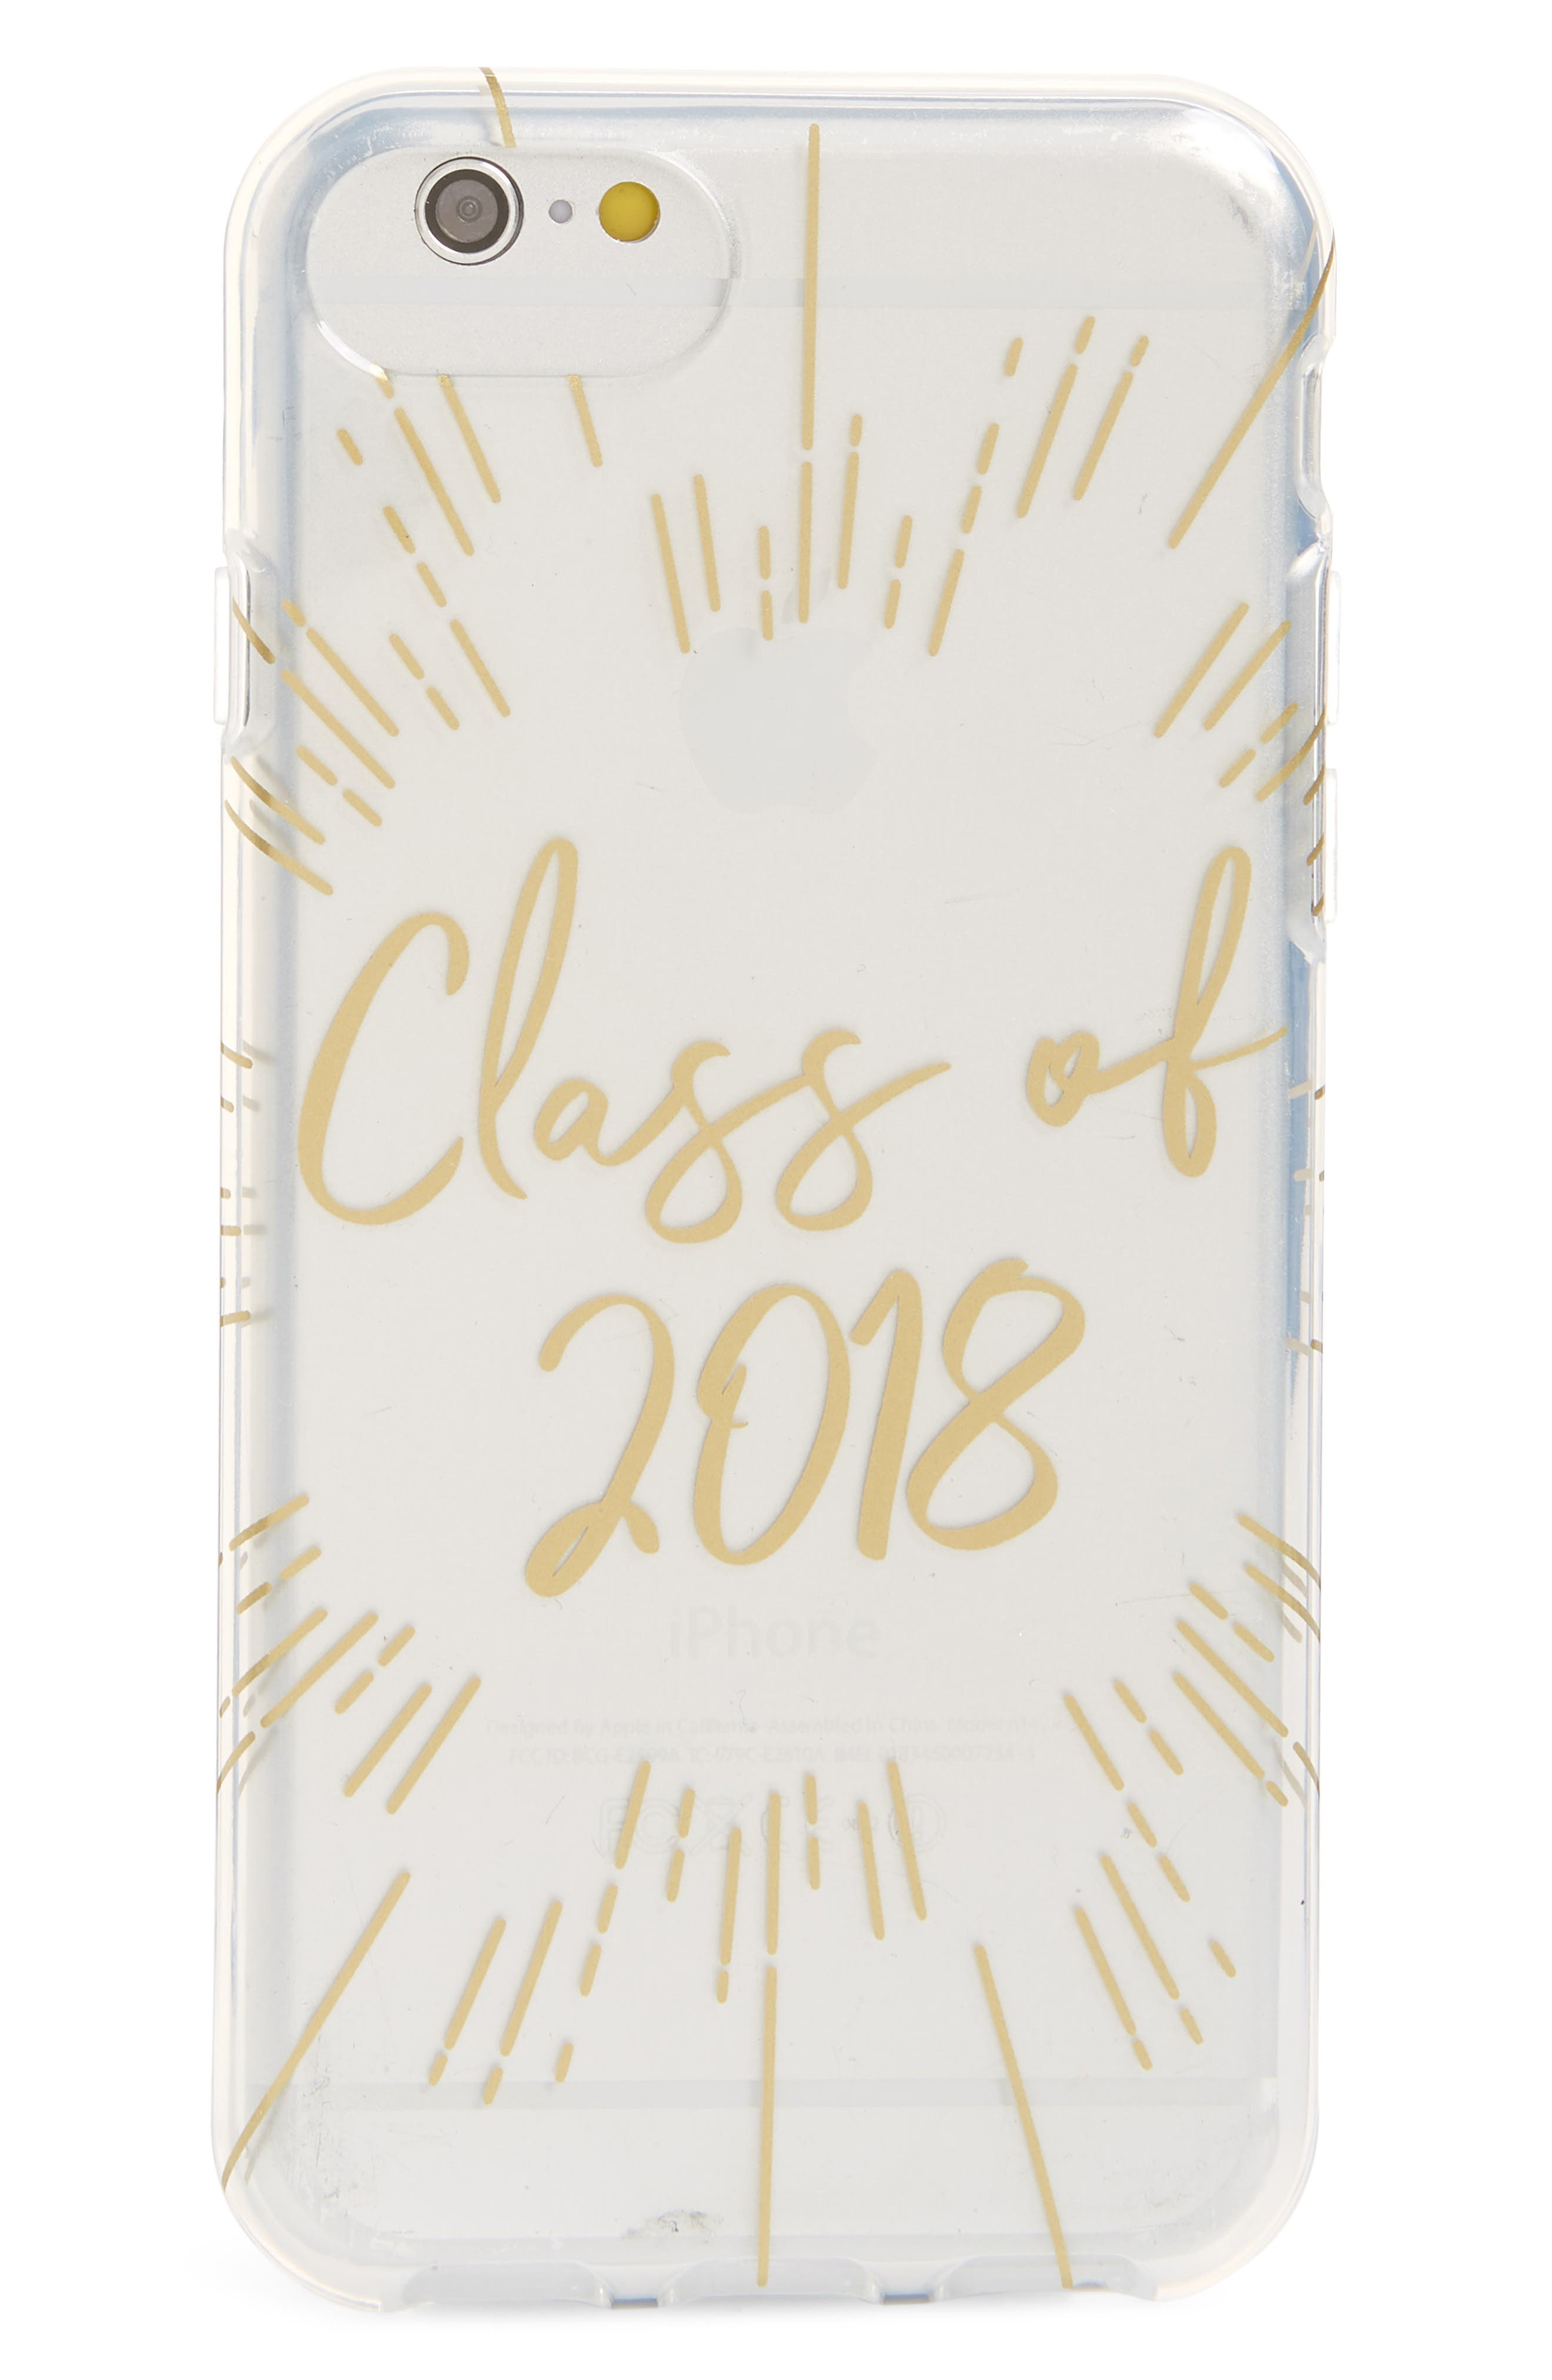 Class of 2018 iPhone 7/8 & 7/8 Plus Case,                             Main thumbnail 1, color,                             Miscellaneous